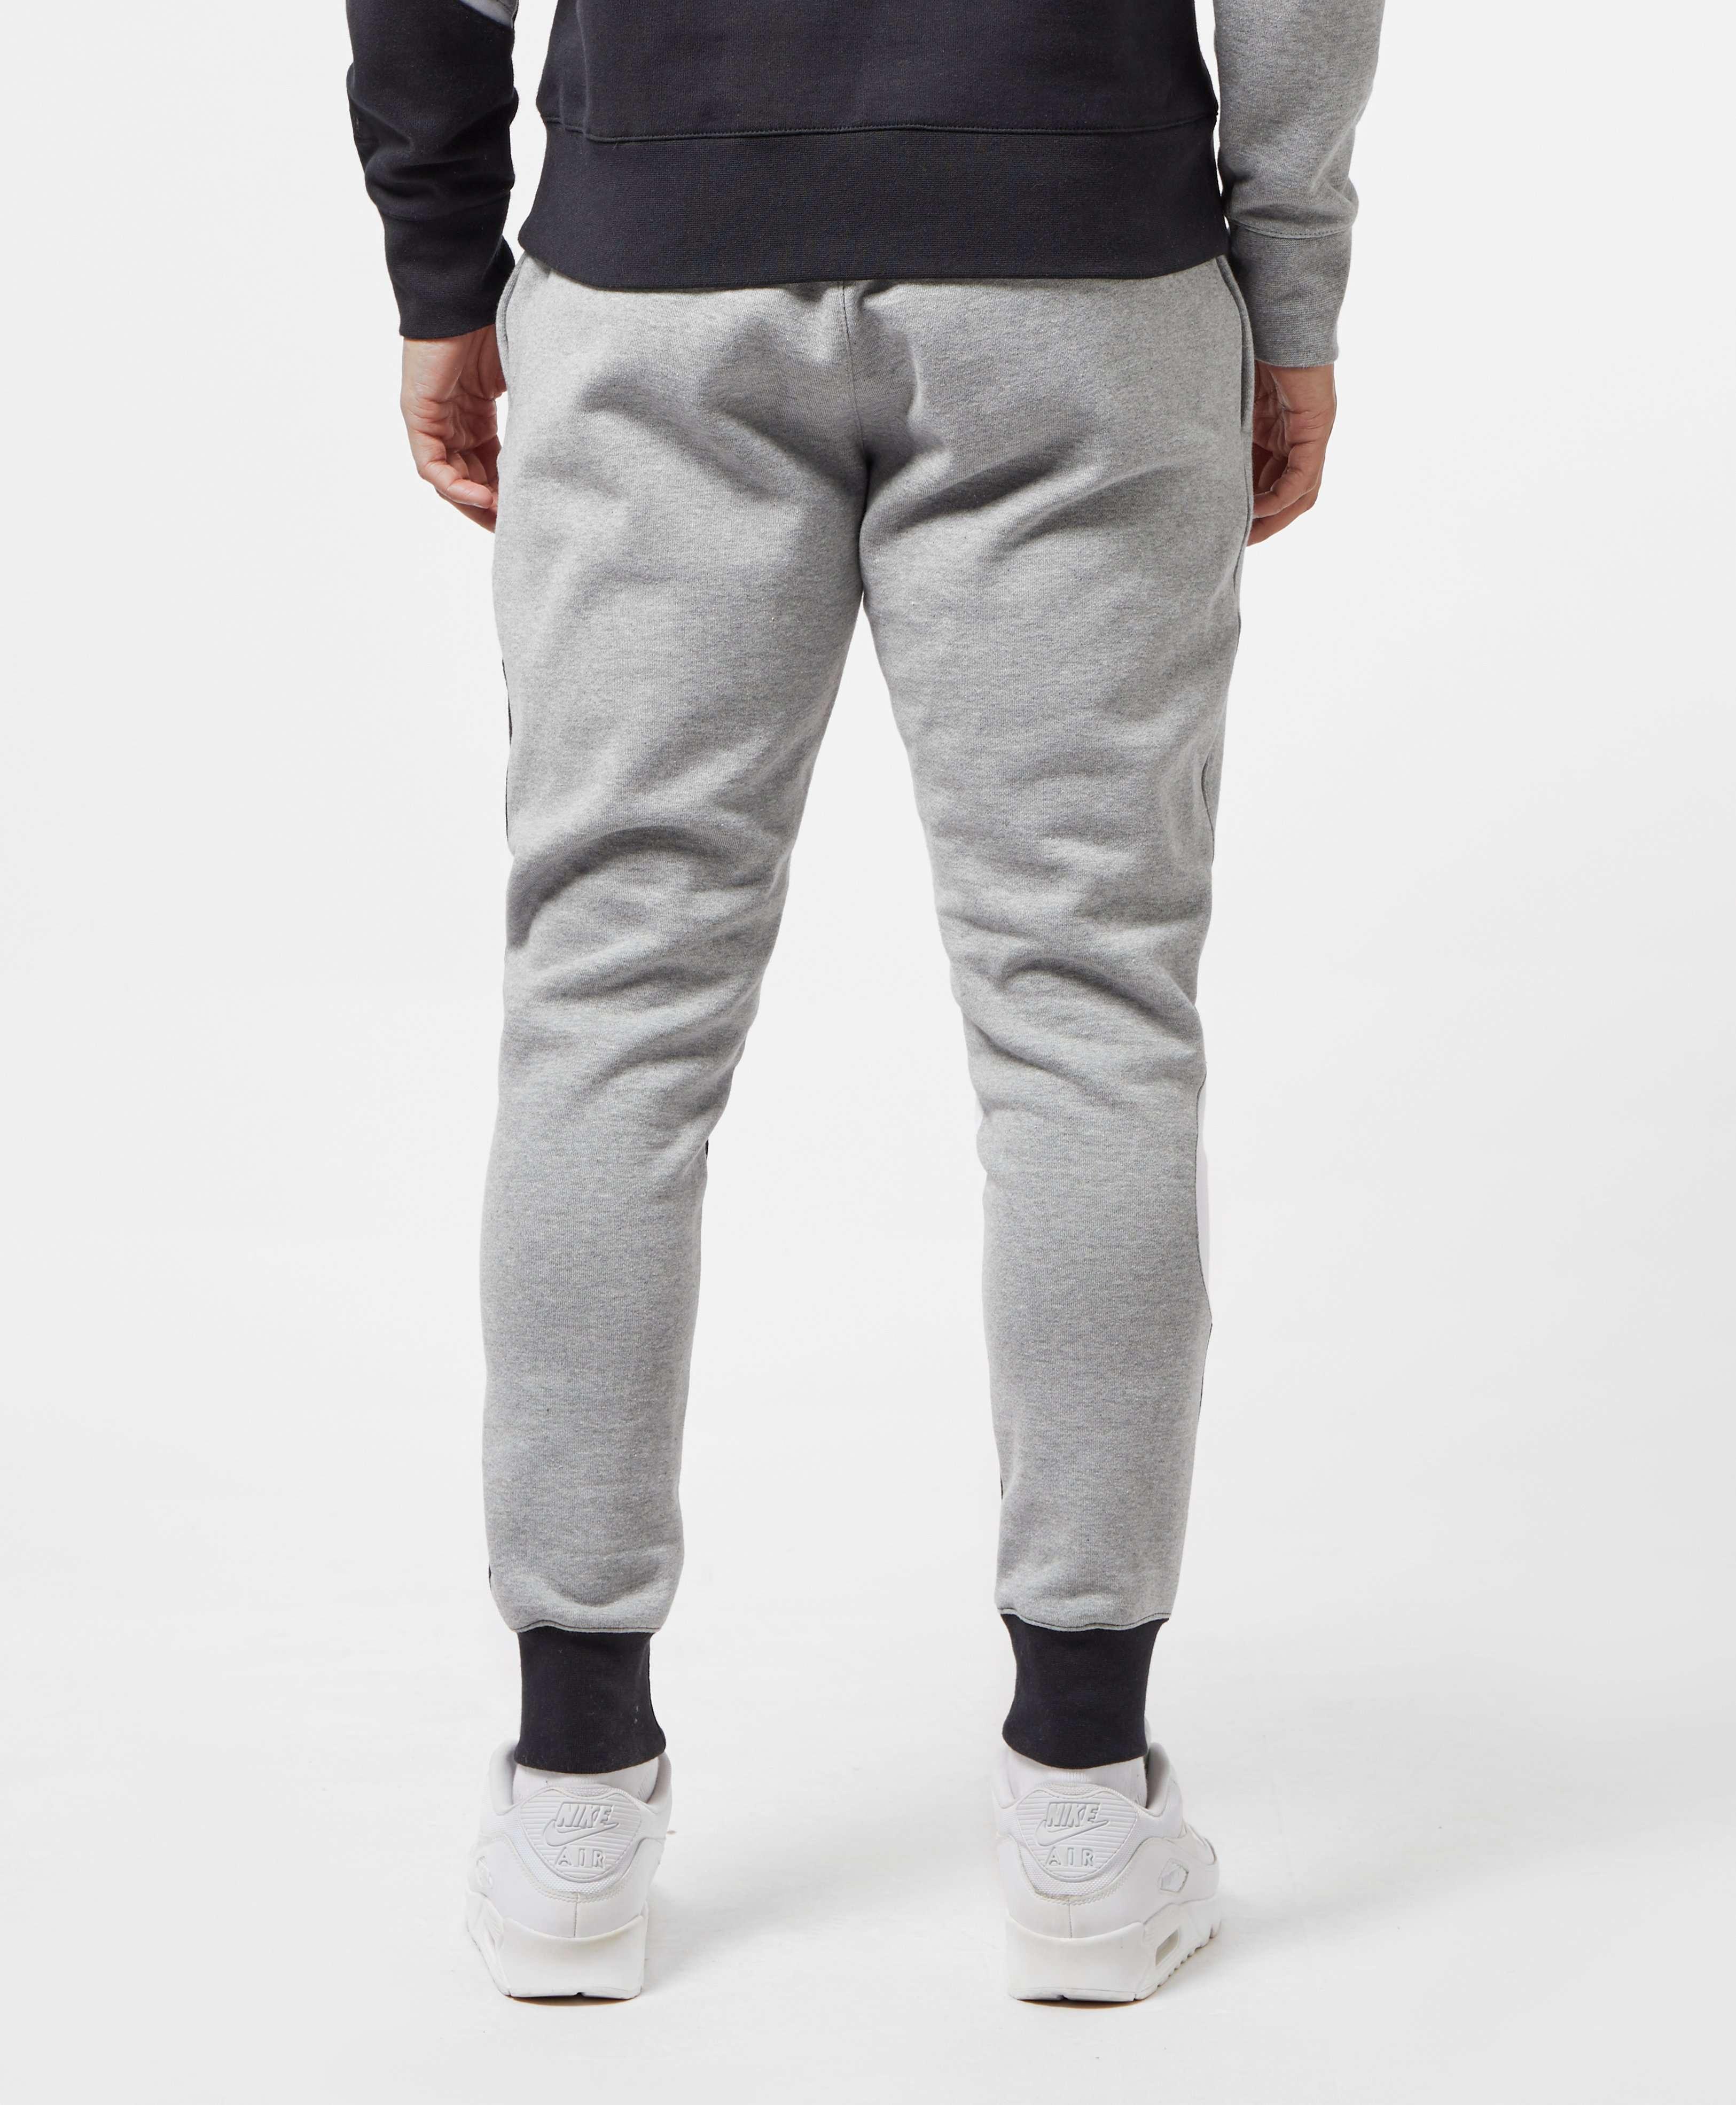 Nike Swoosh Colour Block Fleece Pants